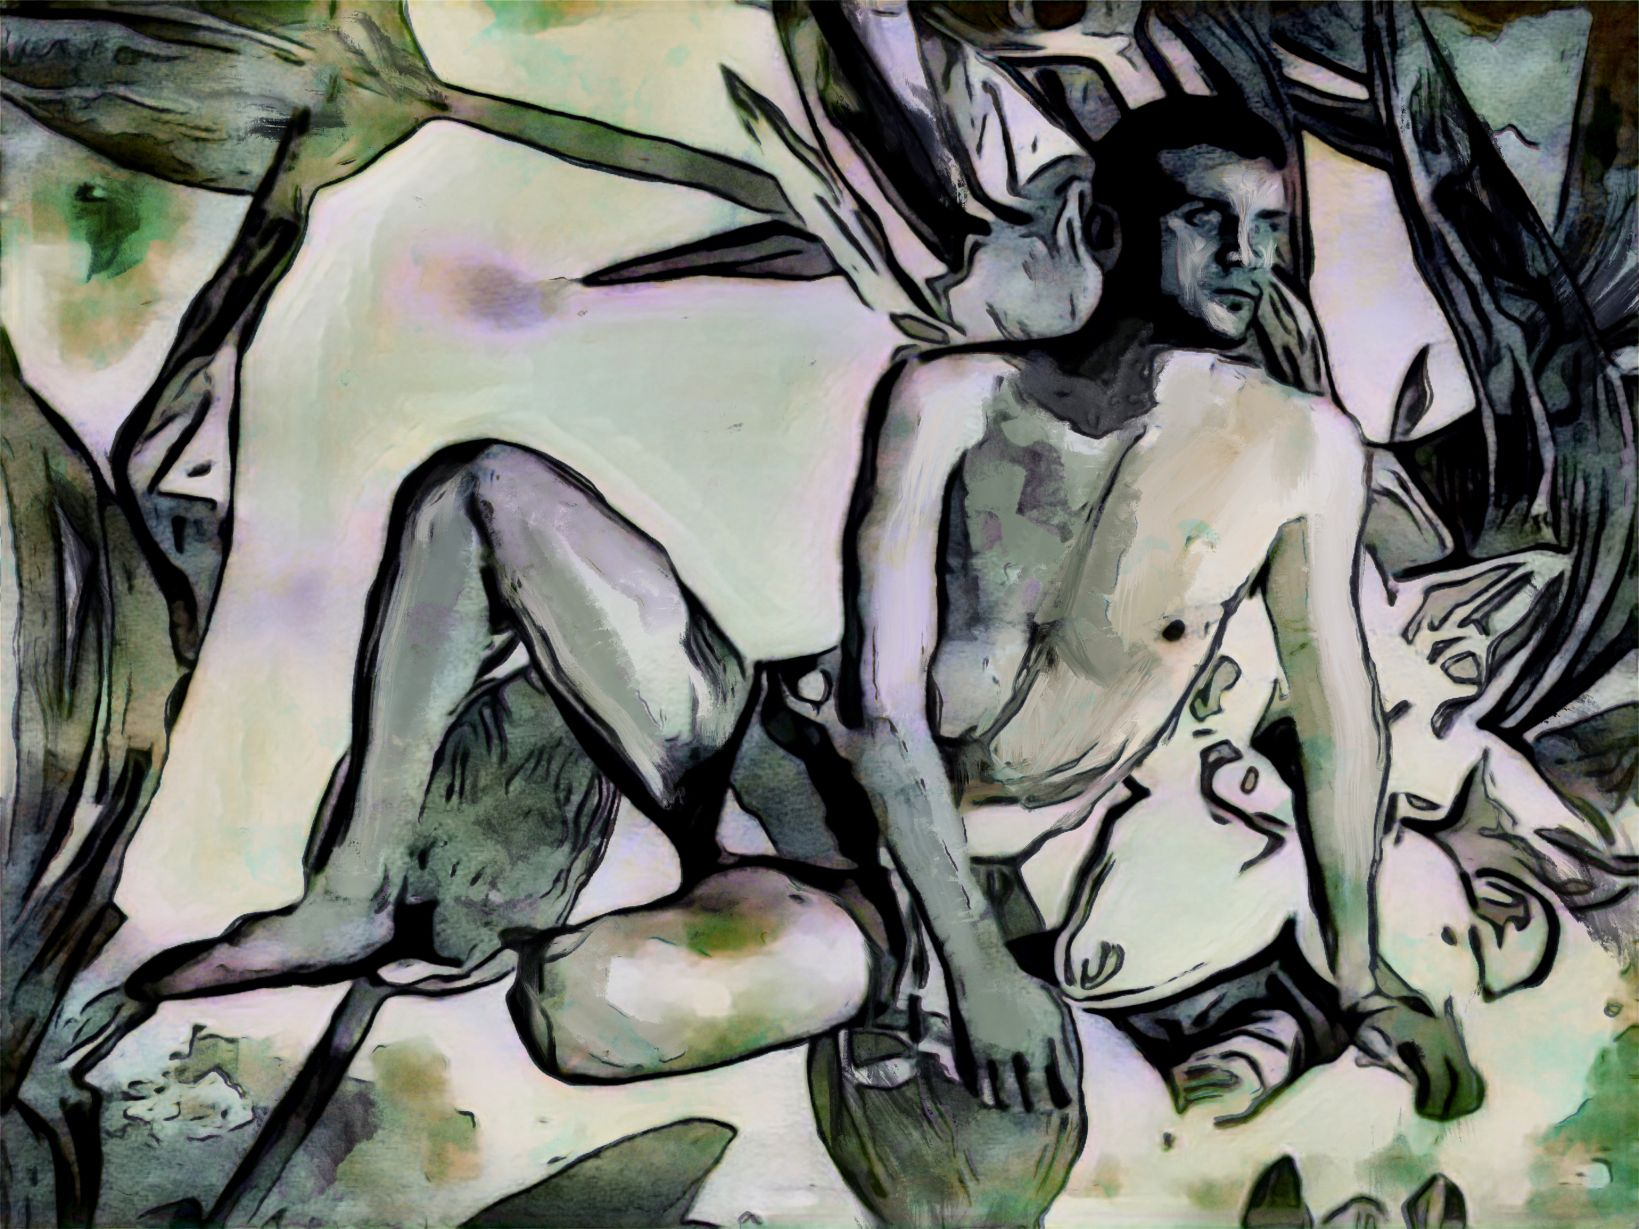 Hombre verde (2021) - Soledad Fernandez Fernandez